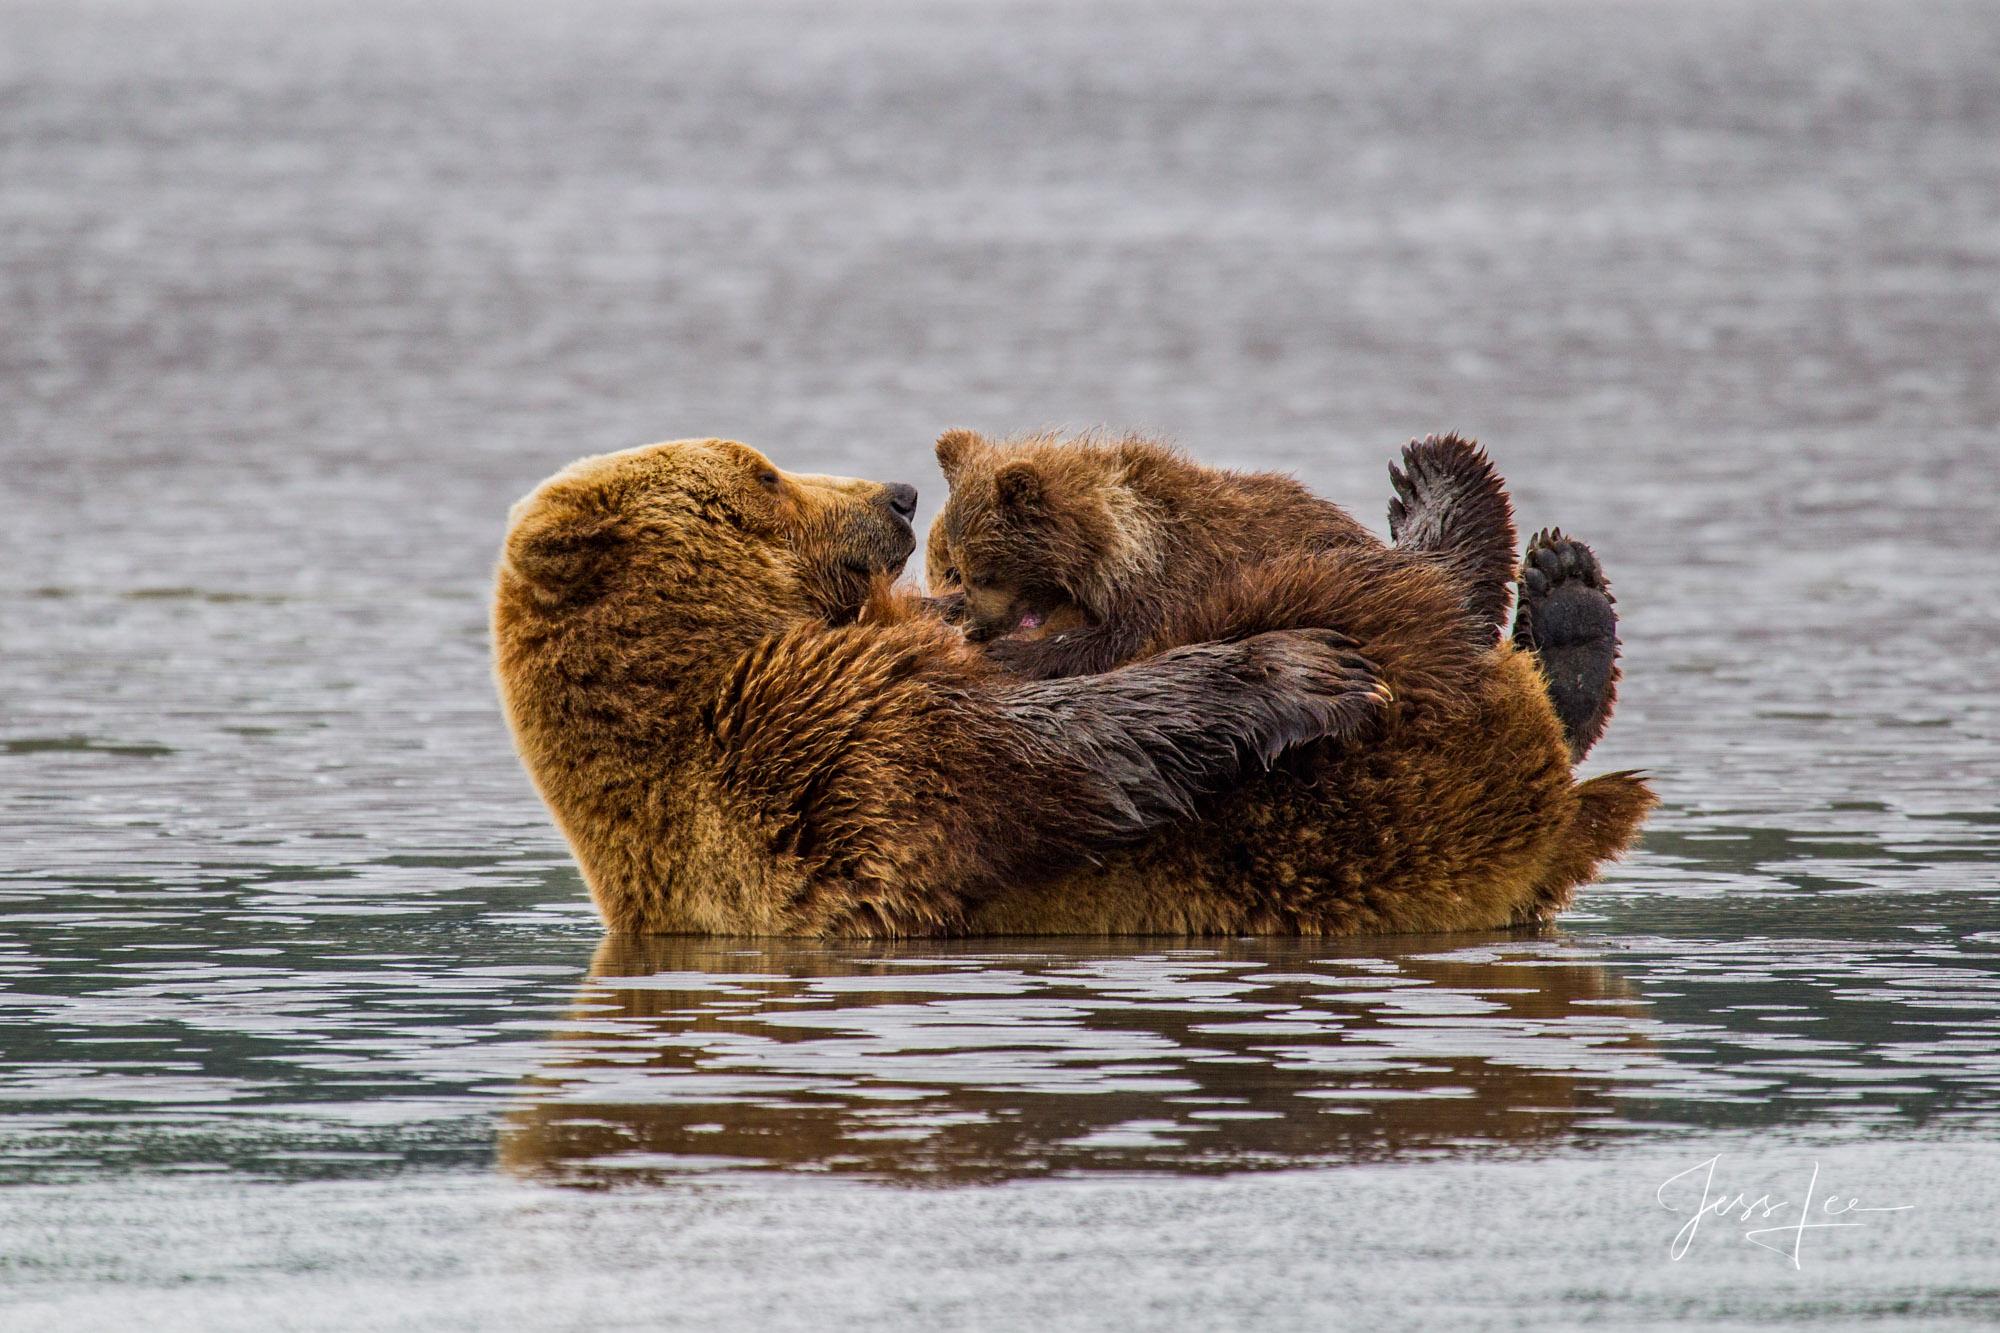 Alaska*, bear*, brown bear*, brown bears*, brown*, coastal*, cubs*, grizzlies*, Grizzly*, Jess Lee*, Cooke inlet, legendary photographer*, national park*, sow*, wildlife*, wildlife photographer*, photo